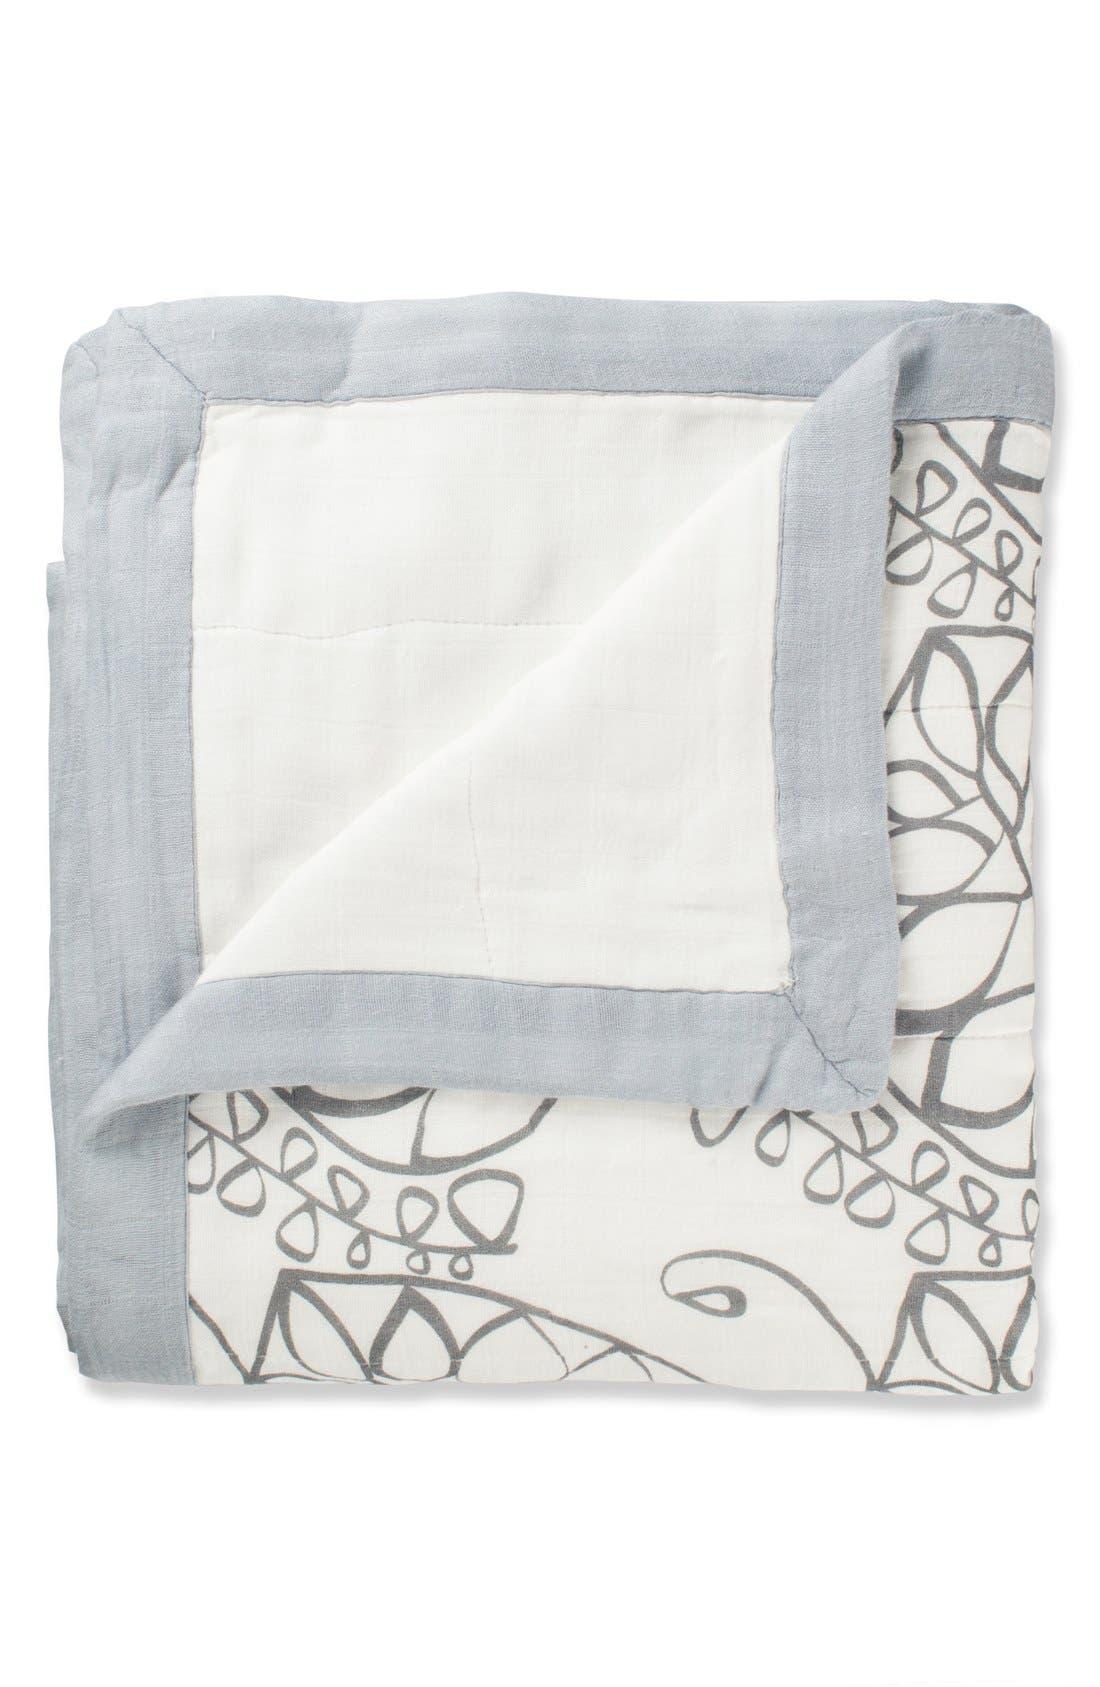 Main Image - aden + anais 'Dream' Blanket